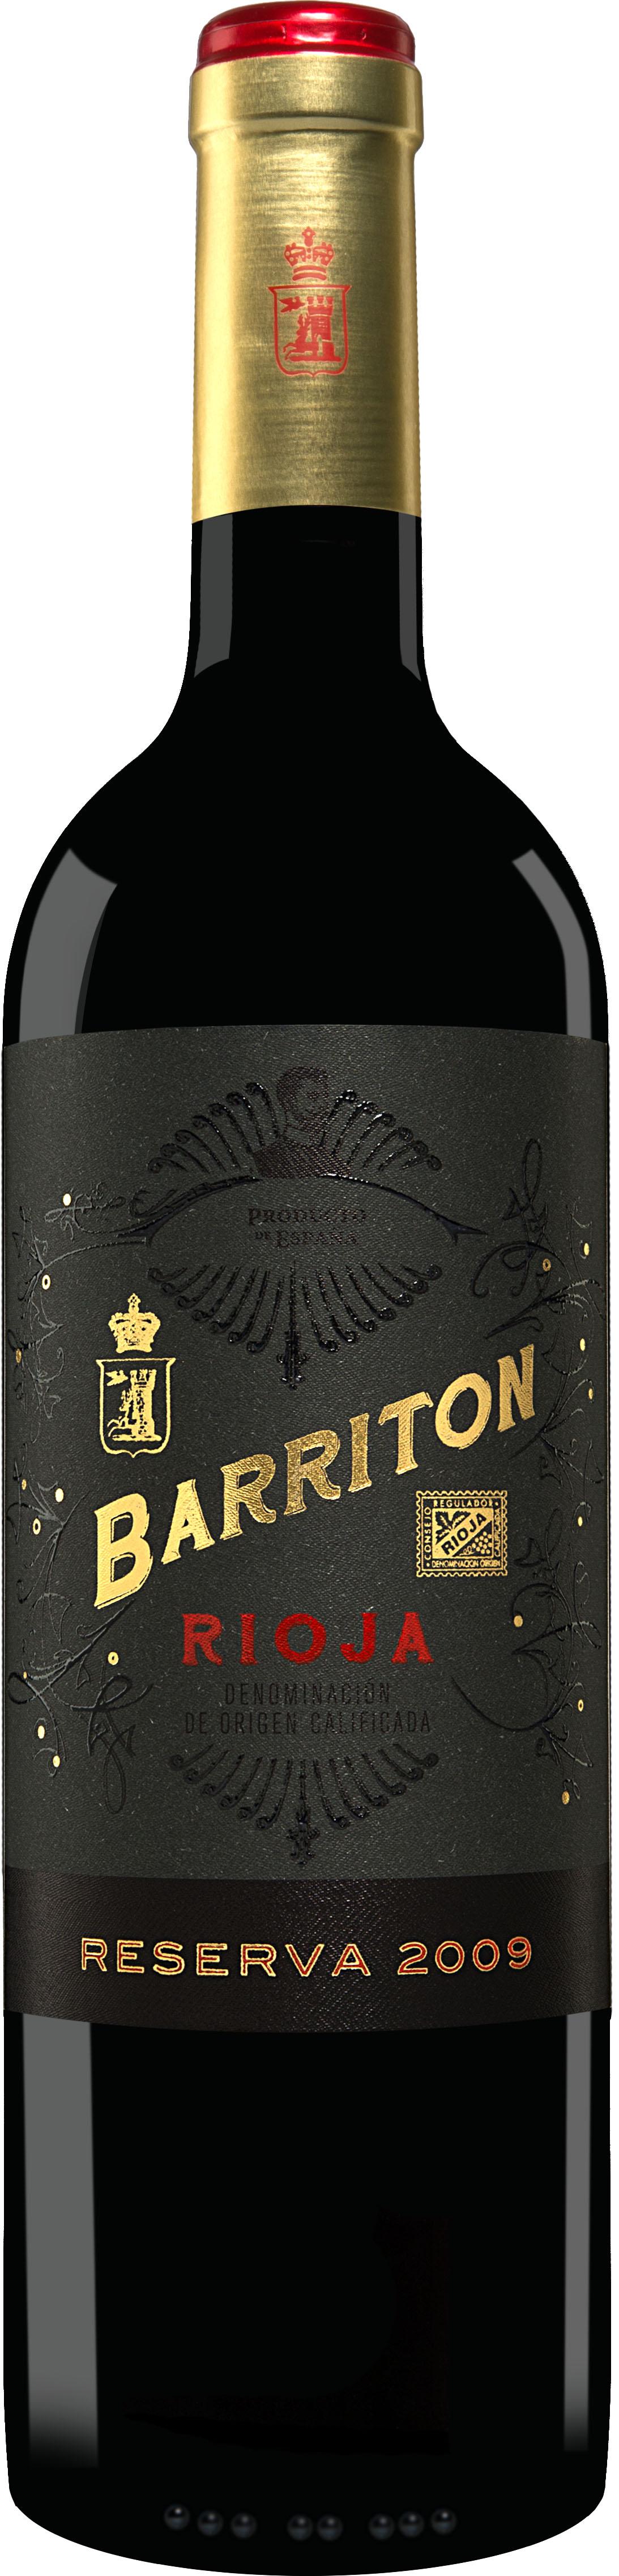 6 x Top-Rioja für 59,90 € statt 122,65 €